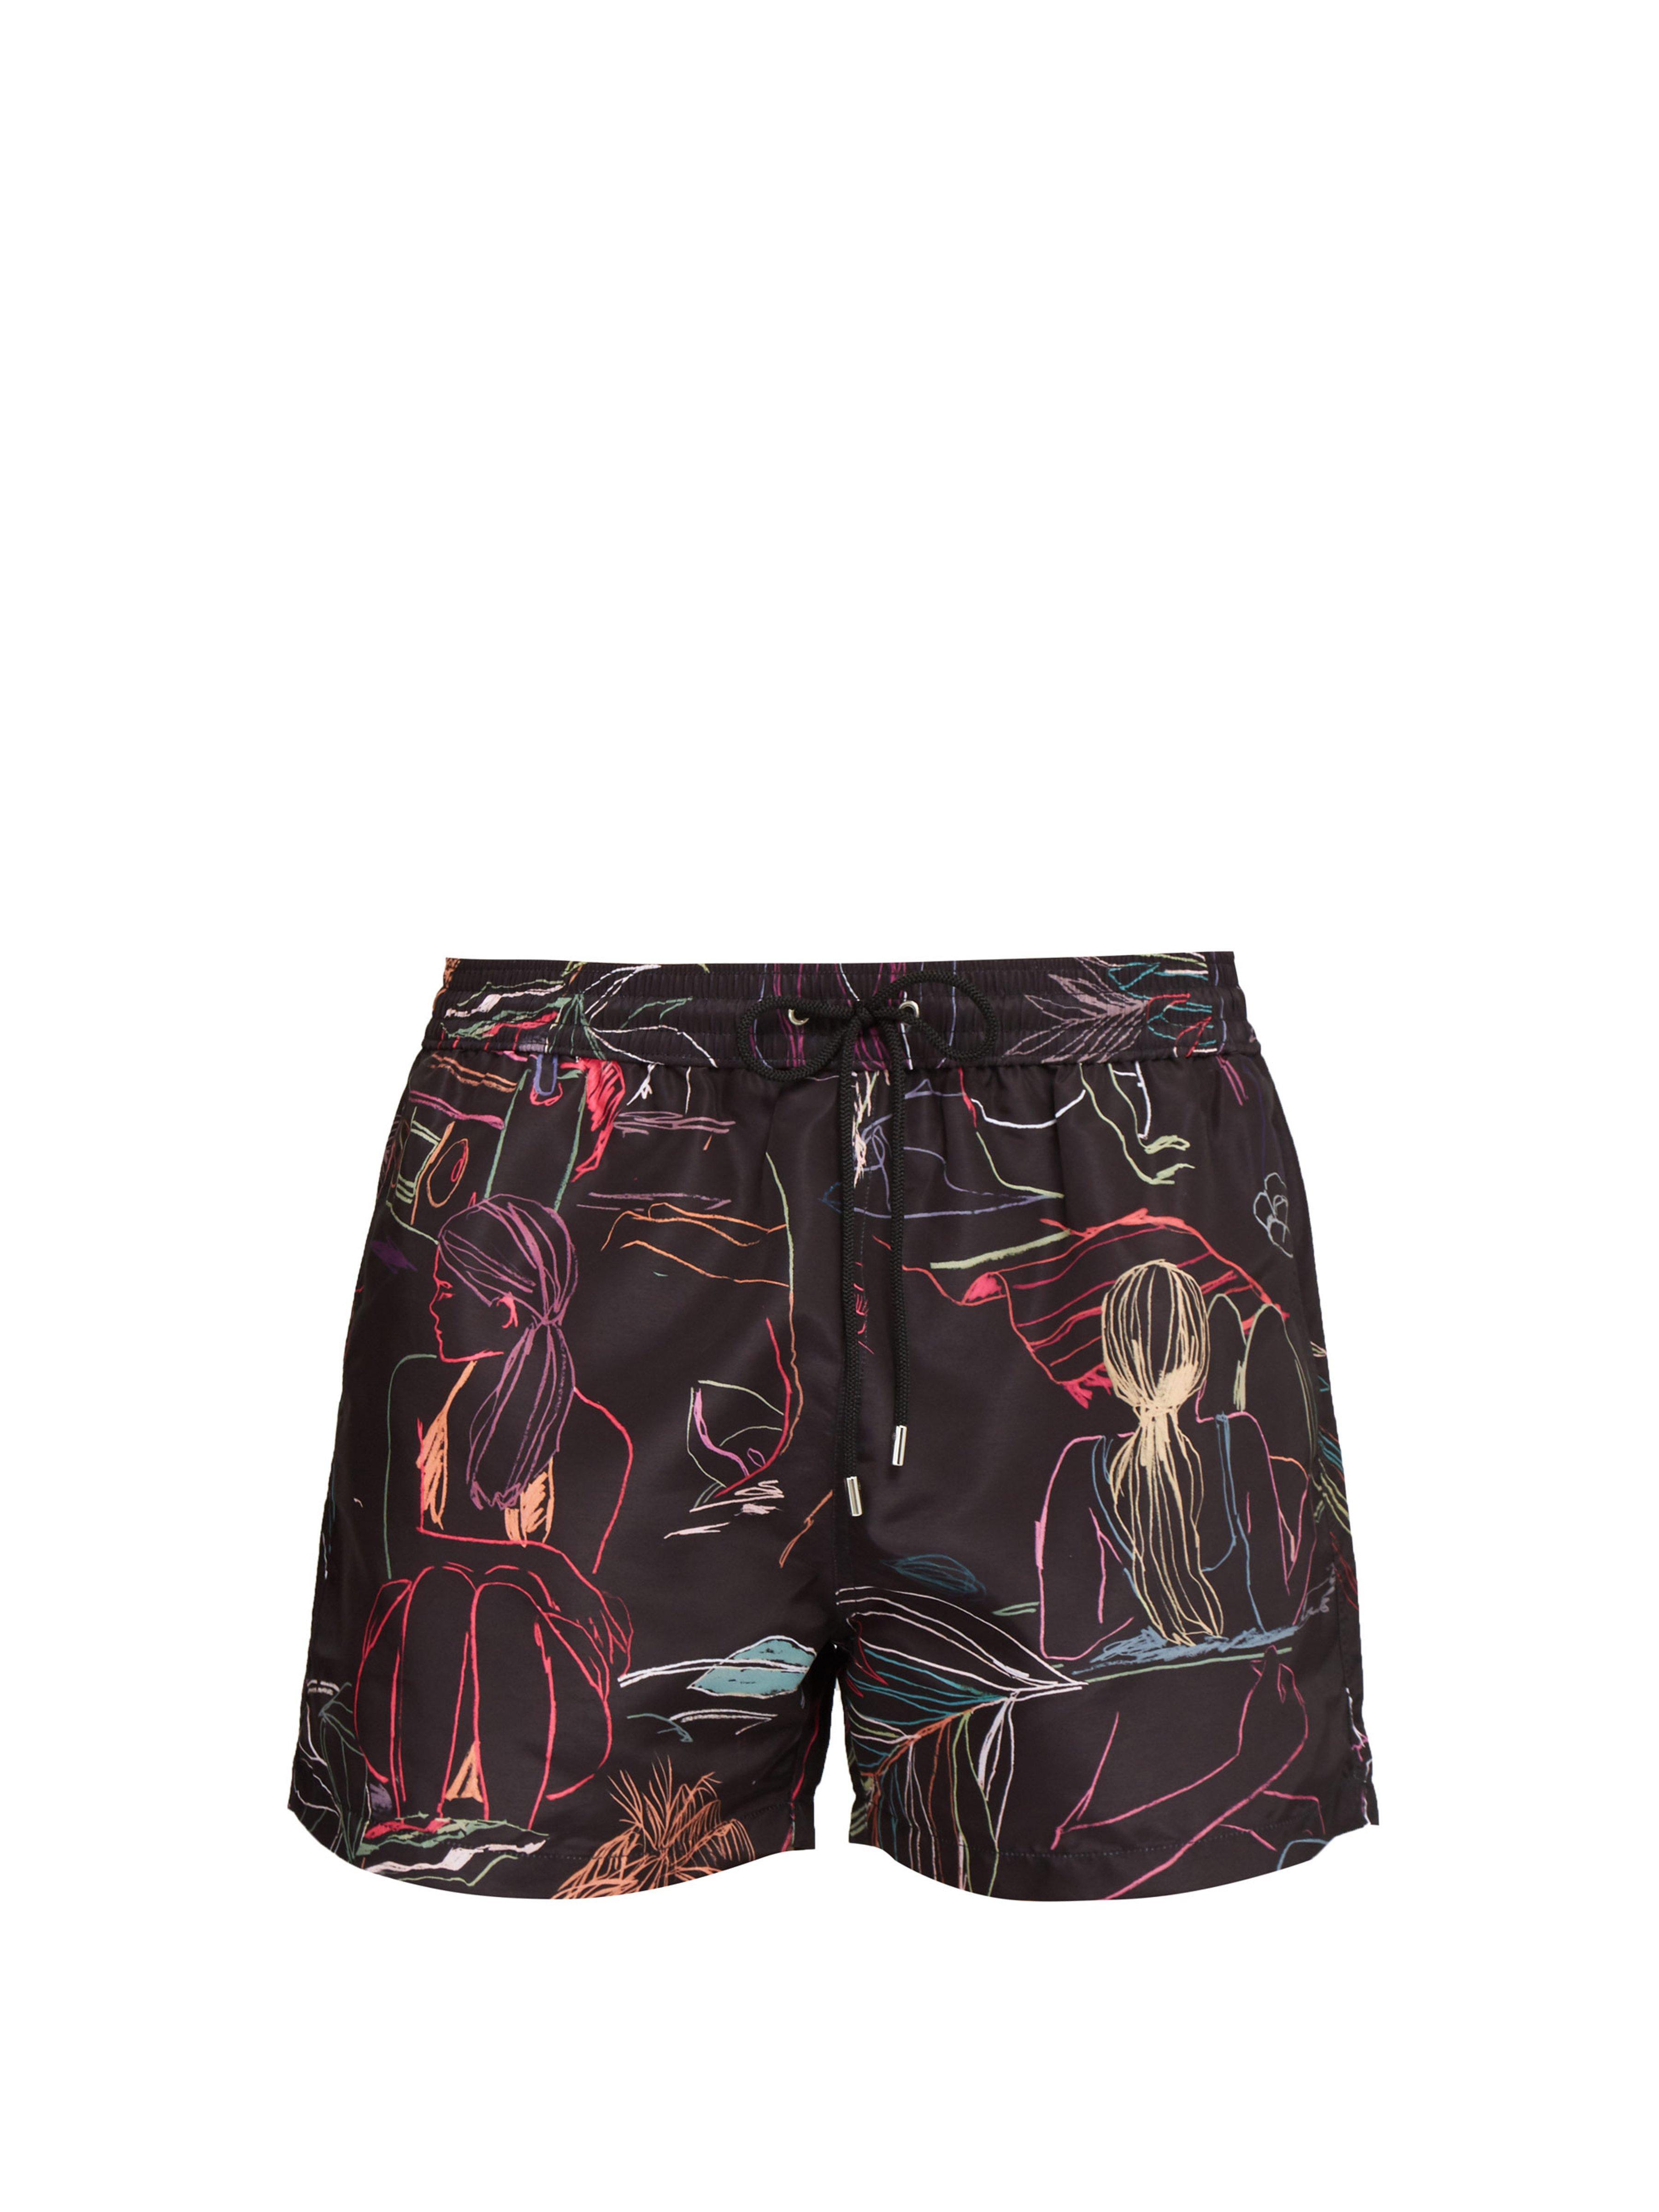 767d7688de Paul Smith Sunbathers Print Swim Shorts in Black for Men - Lyst